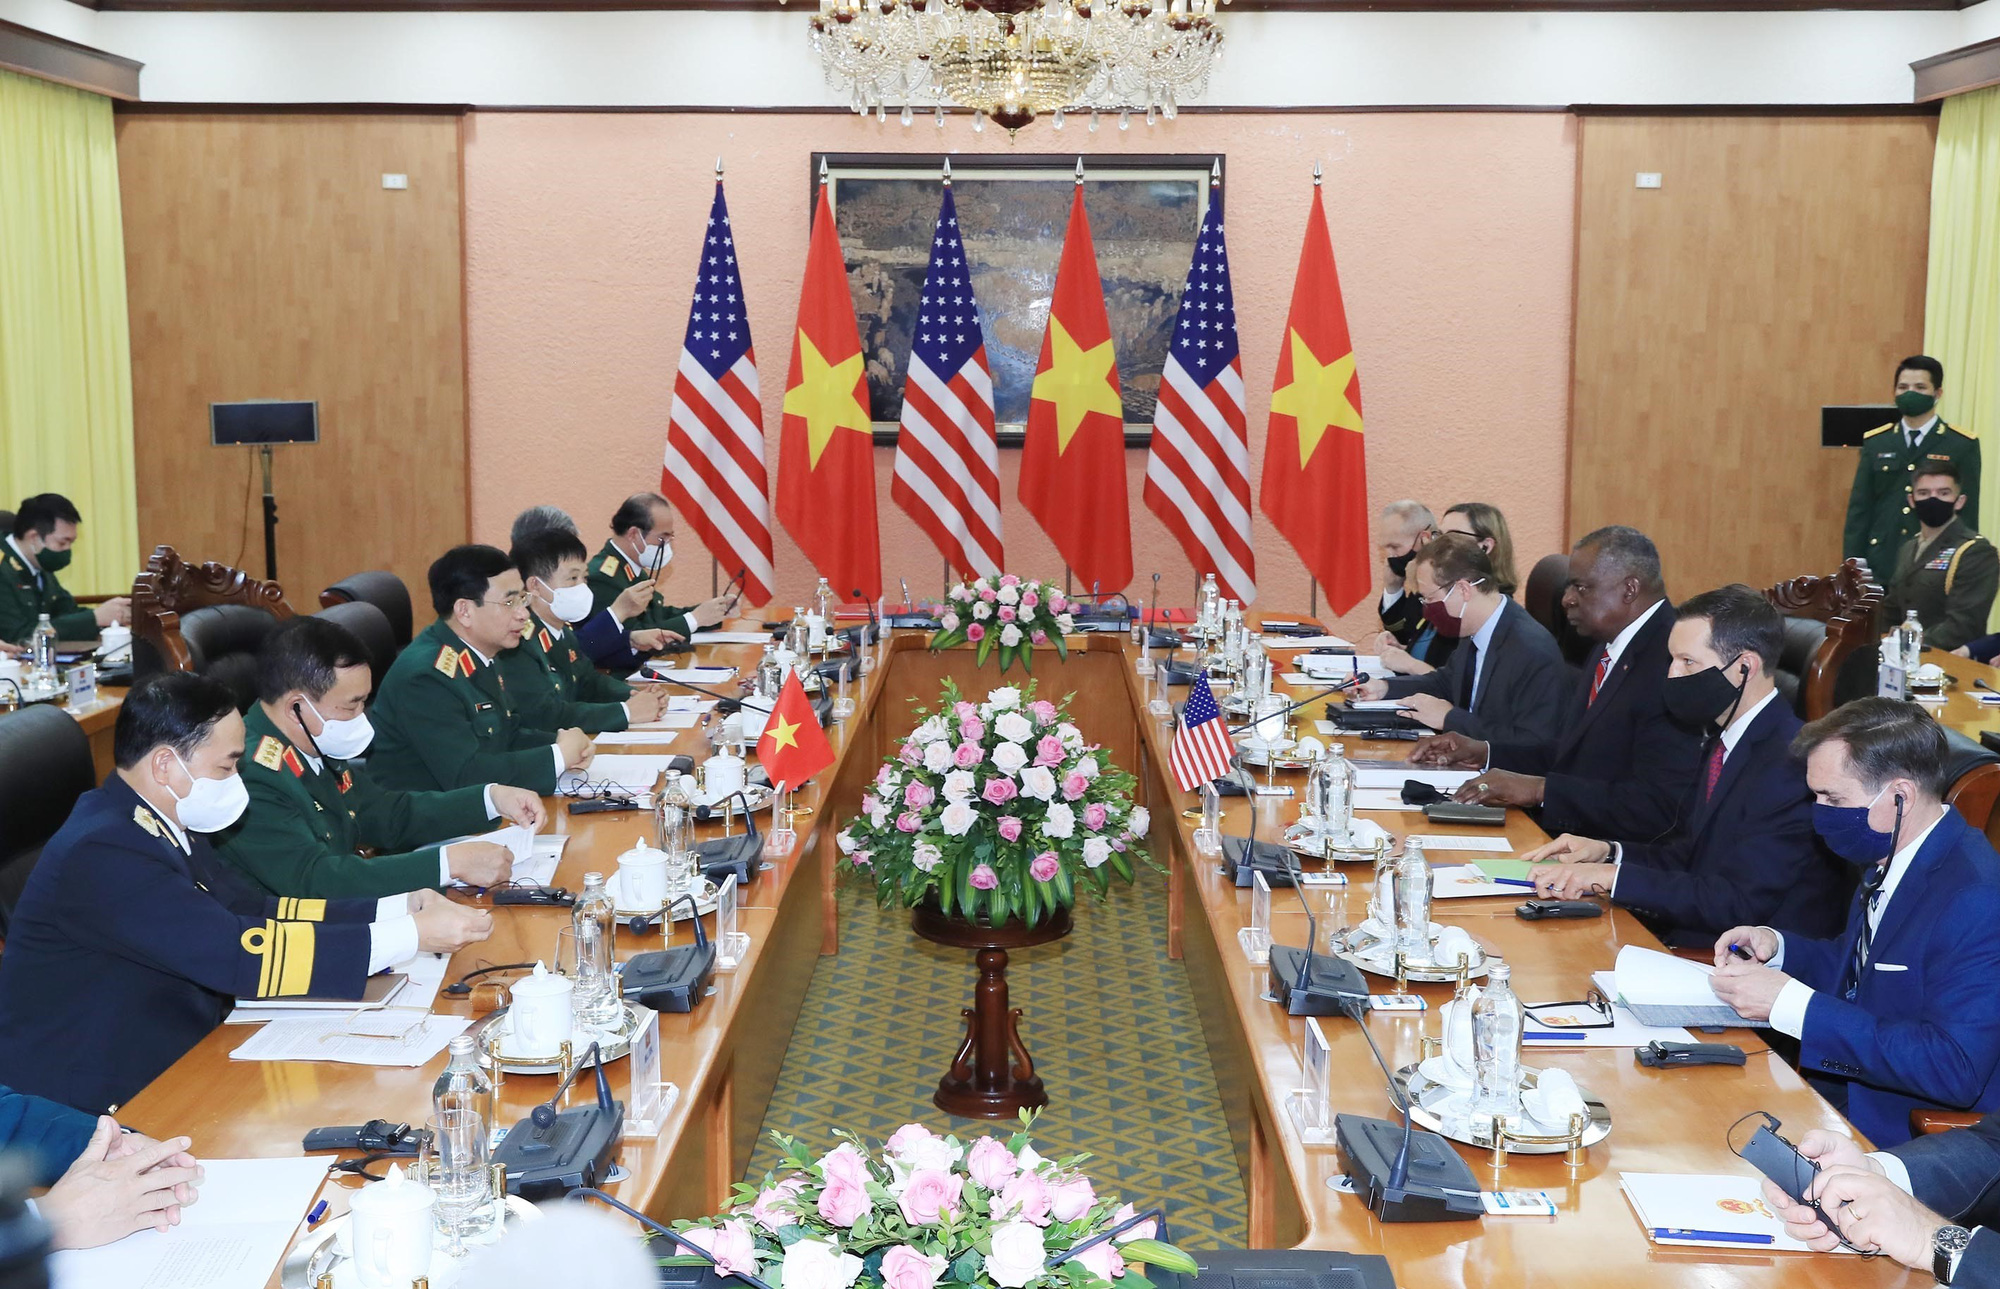 United States Secretary of Defense Lloyd Austin and Vietnamese Minister of National Defense Phan Van Giang hold talks in Hanoi, July 29, 2021. Photo: Vietnam News Agency